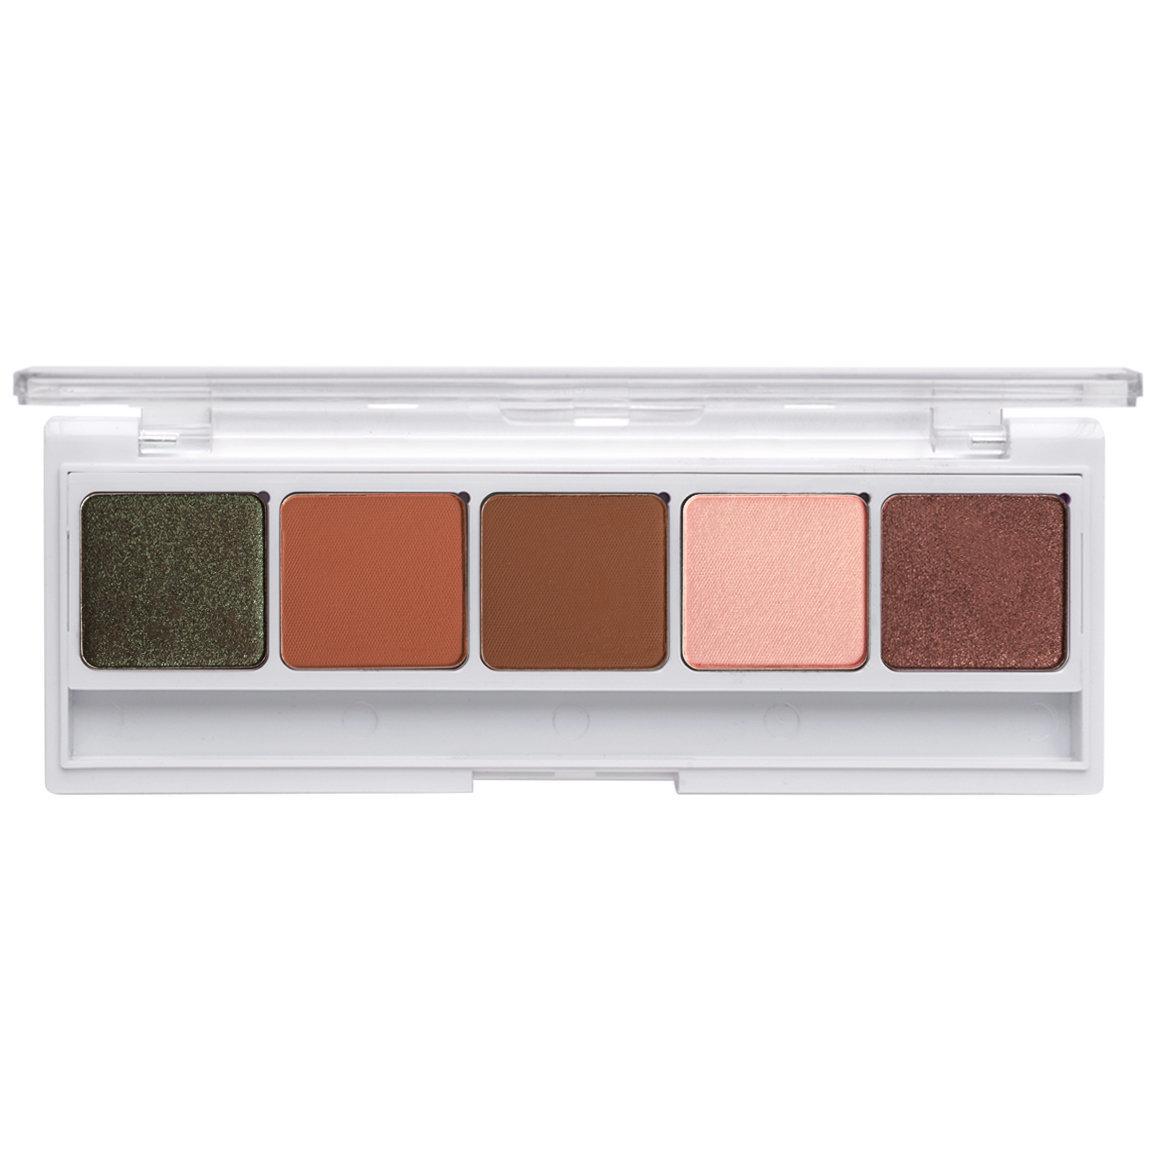 Natasha Denona Eyeshadow Palette 5 Palette 13 product swatch.